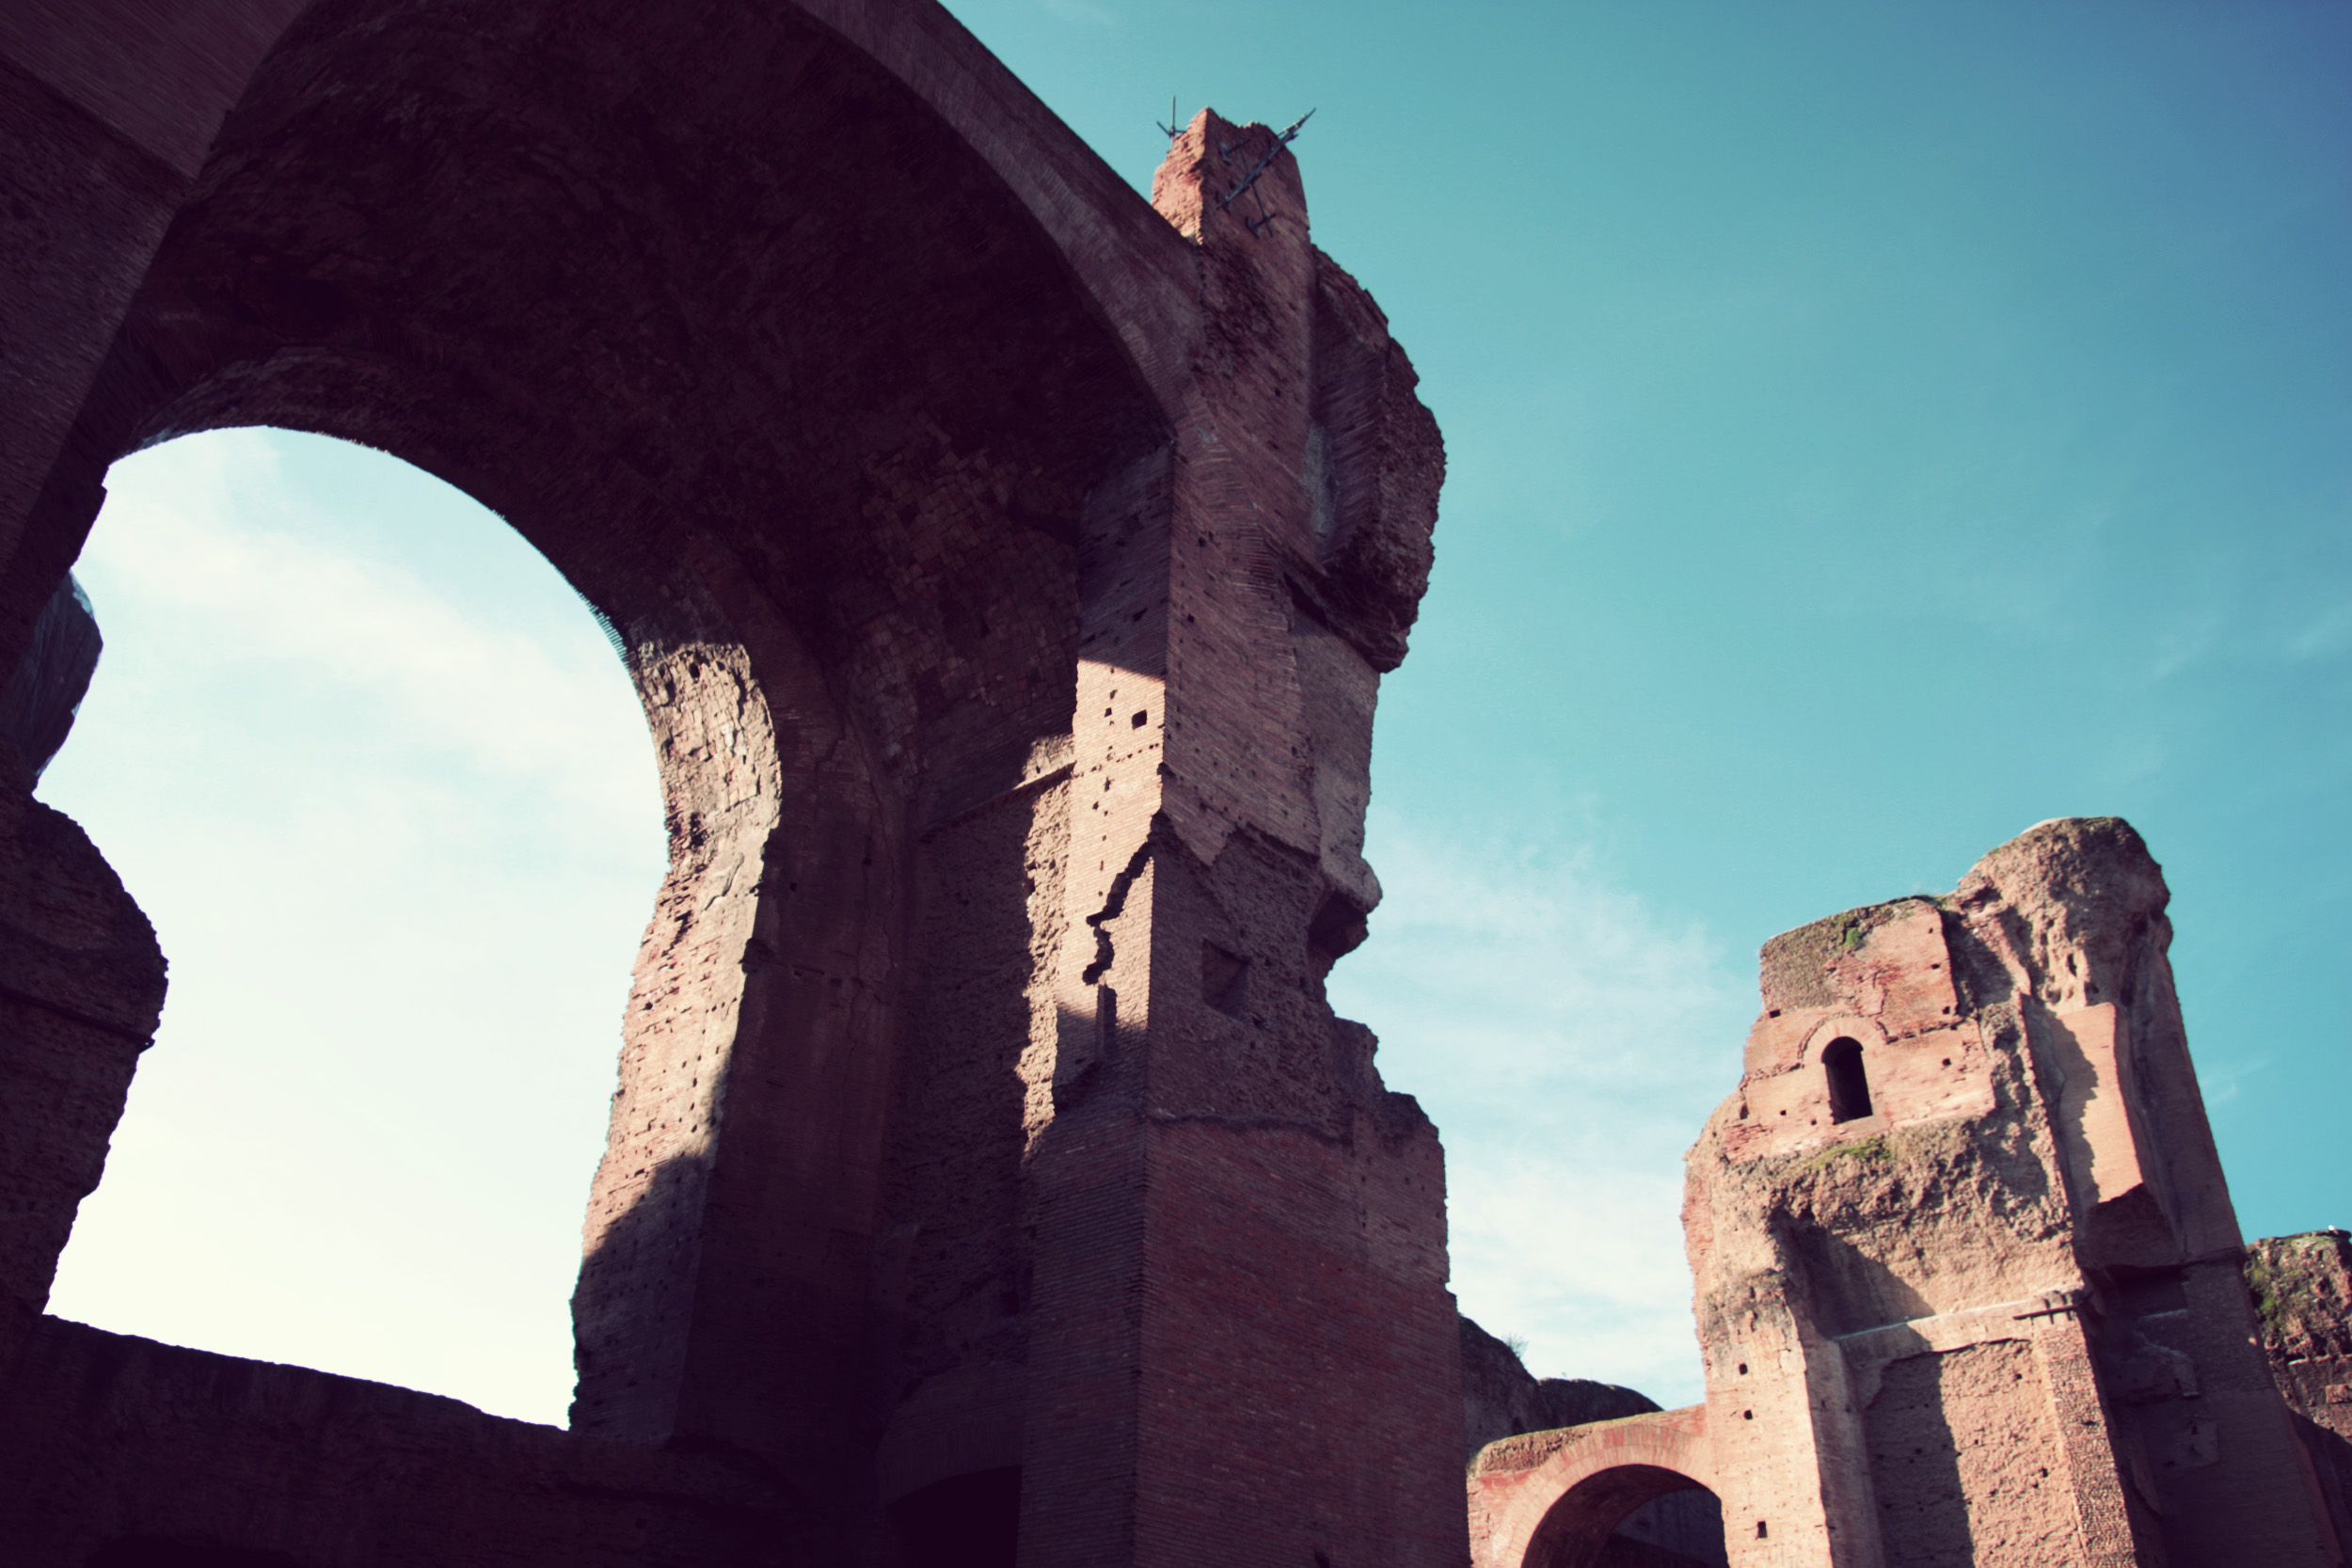 Baths-of-Caracalla_17.jpg